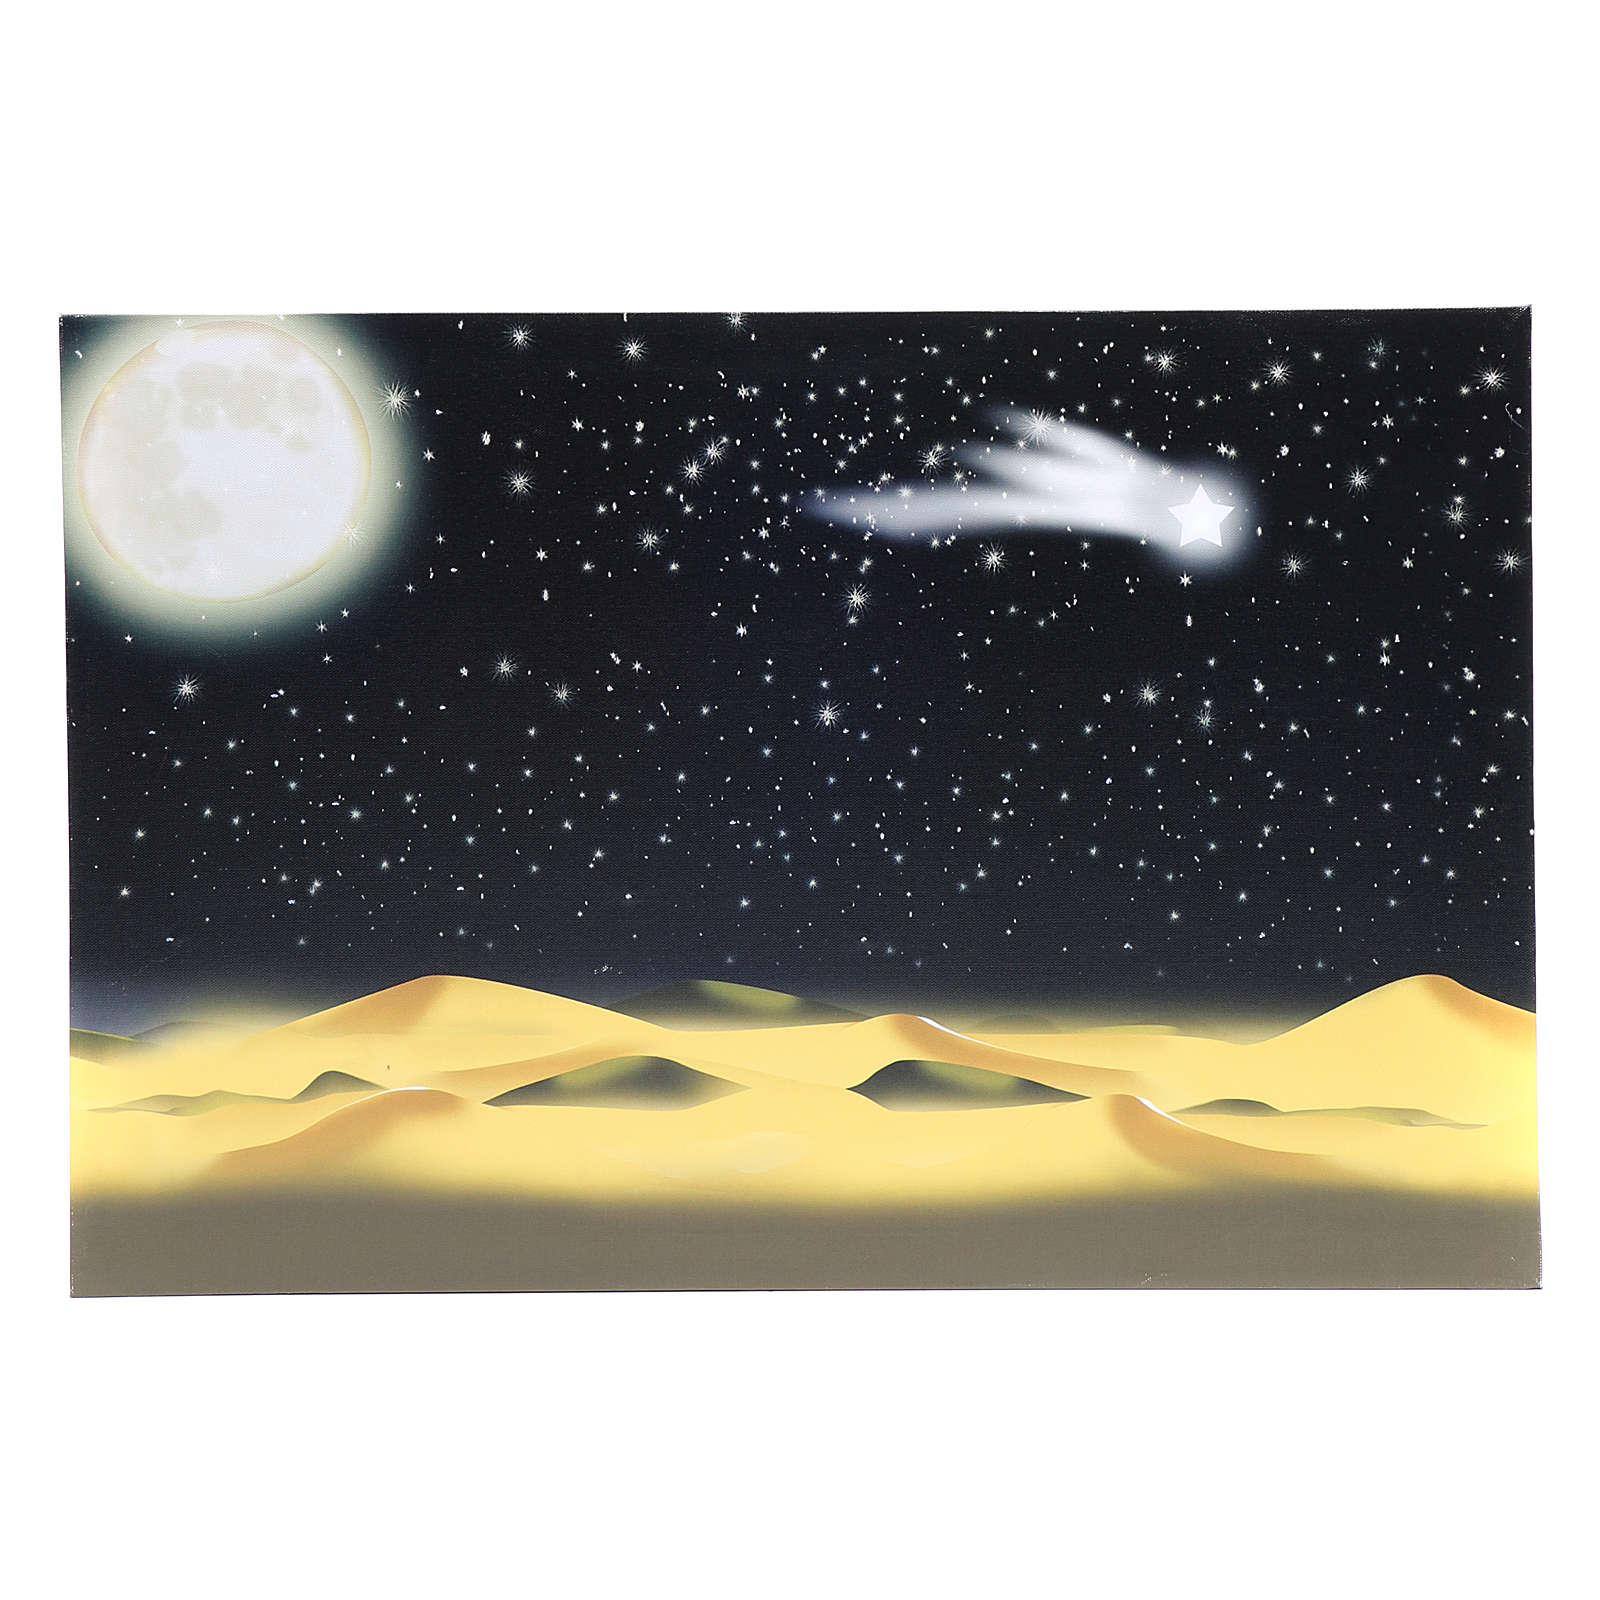 Illuminated starry sky with moon backdrop 40x60 cm 4